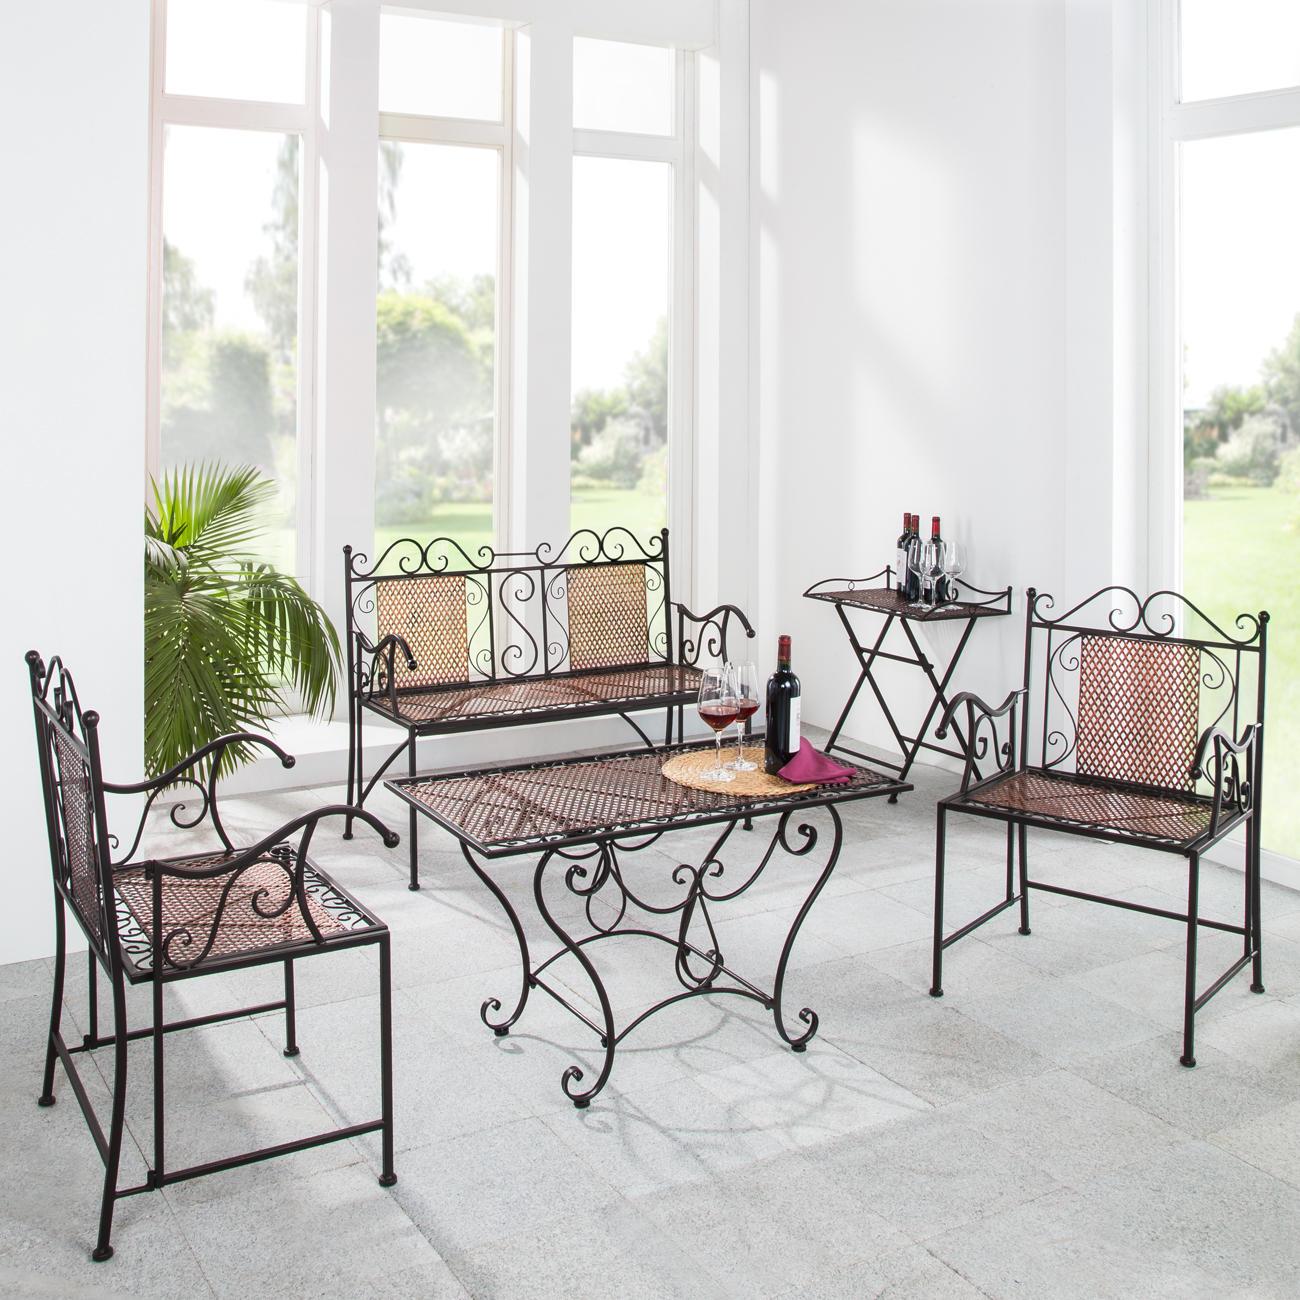 Romantik Falt-Sessel, -Bank oder -Garnitur ::  -  -  - Erwachsene